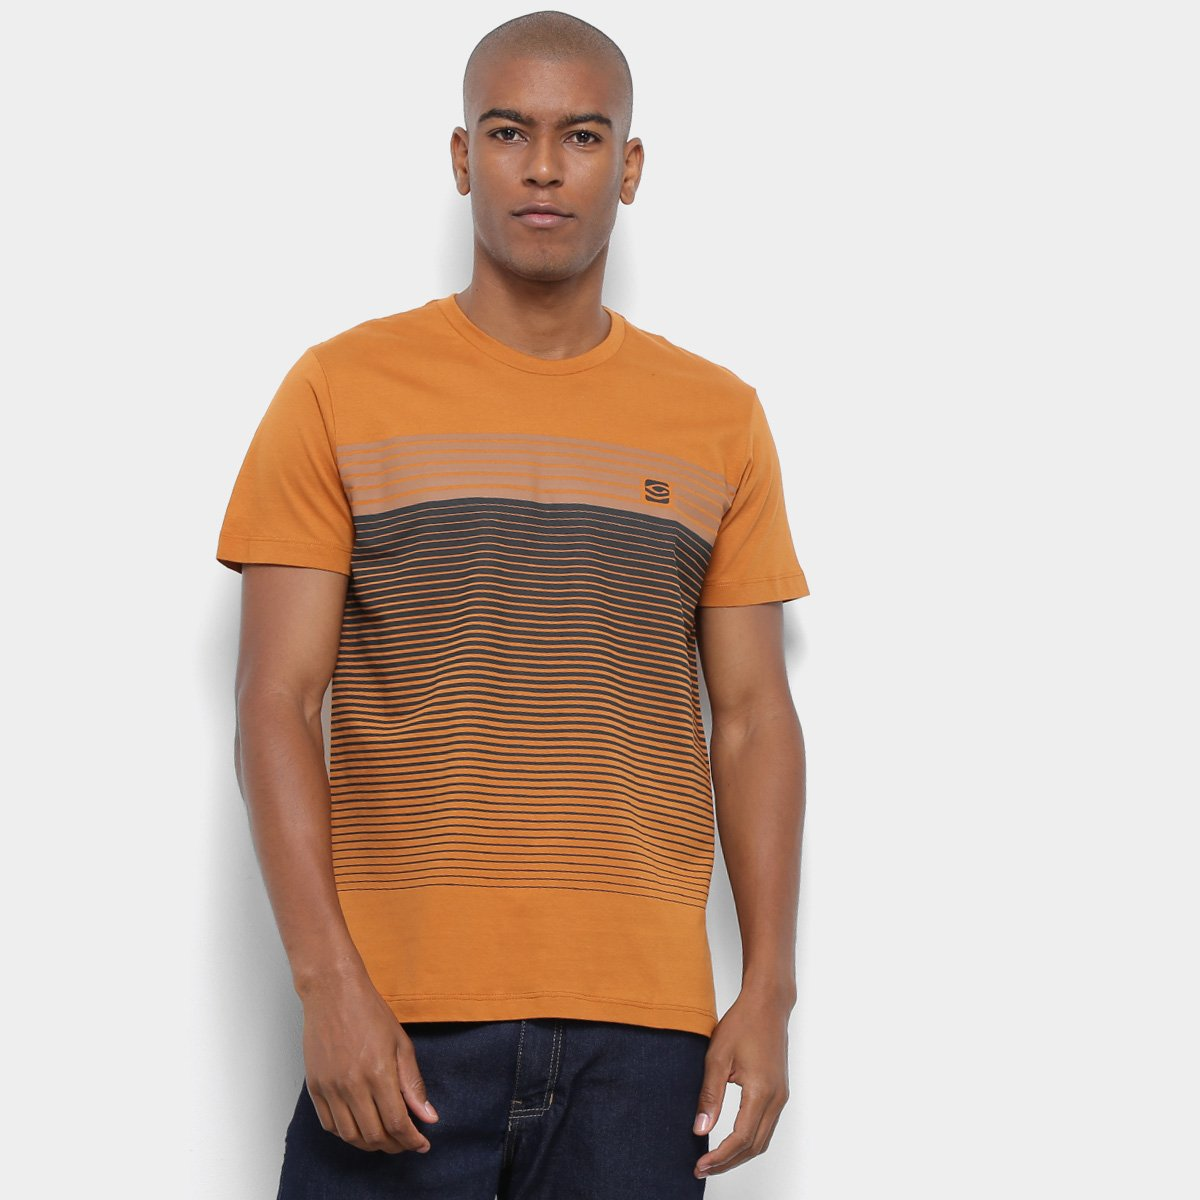 8eb897a47d Camiseta Long Island Listras Masculina